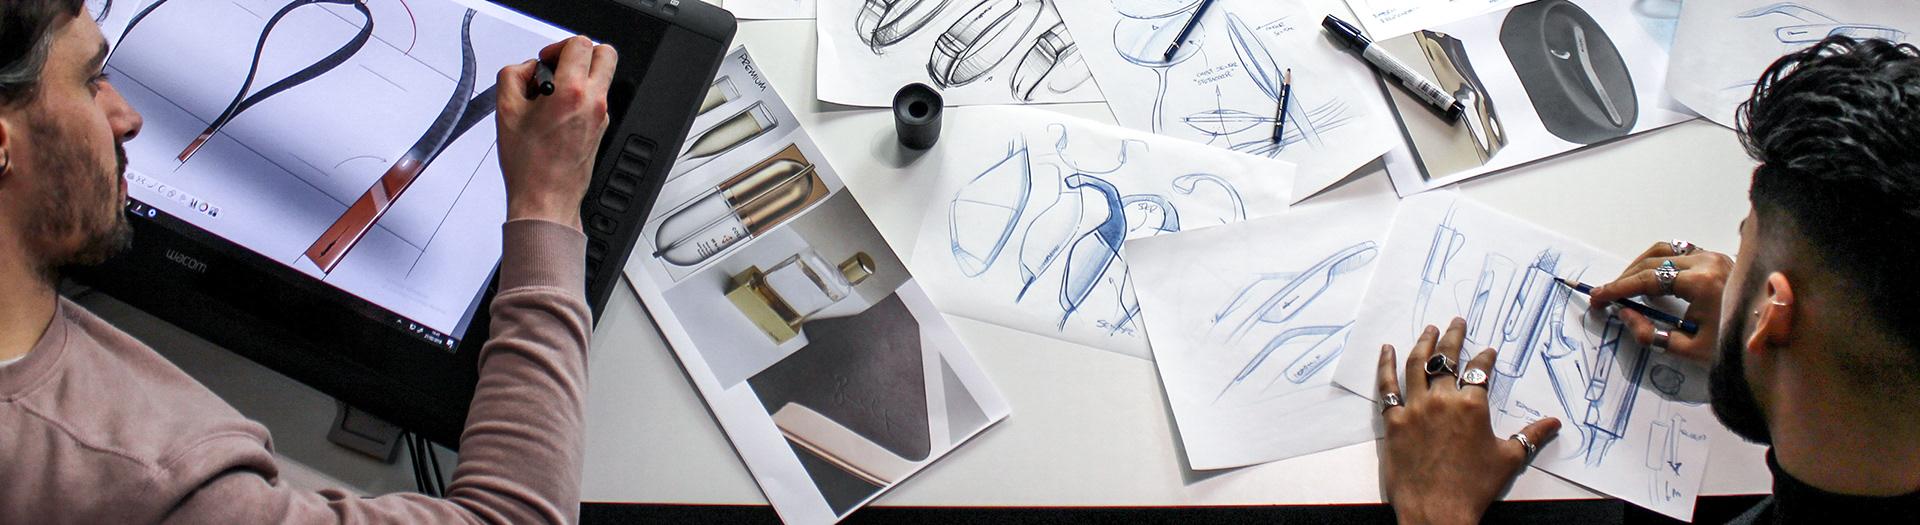 Curventa - Ideation - industrial designer - sketching - id sketching - digital rendering - blue pencil sketches - product design sketches